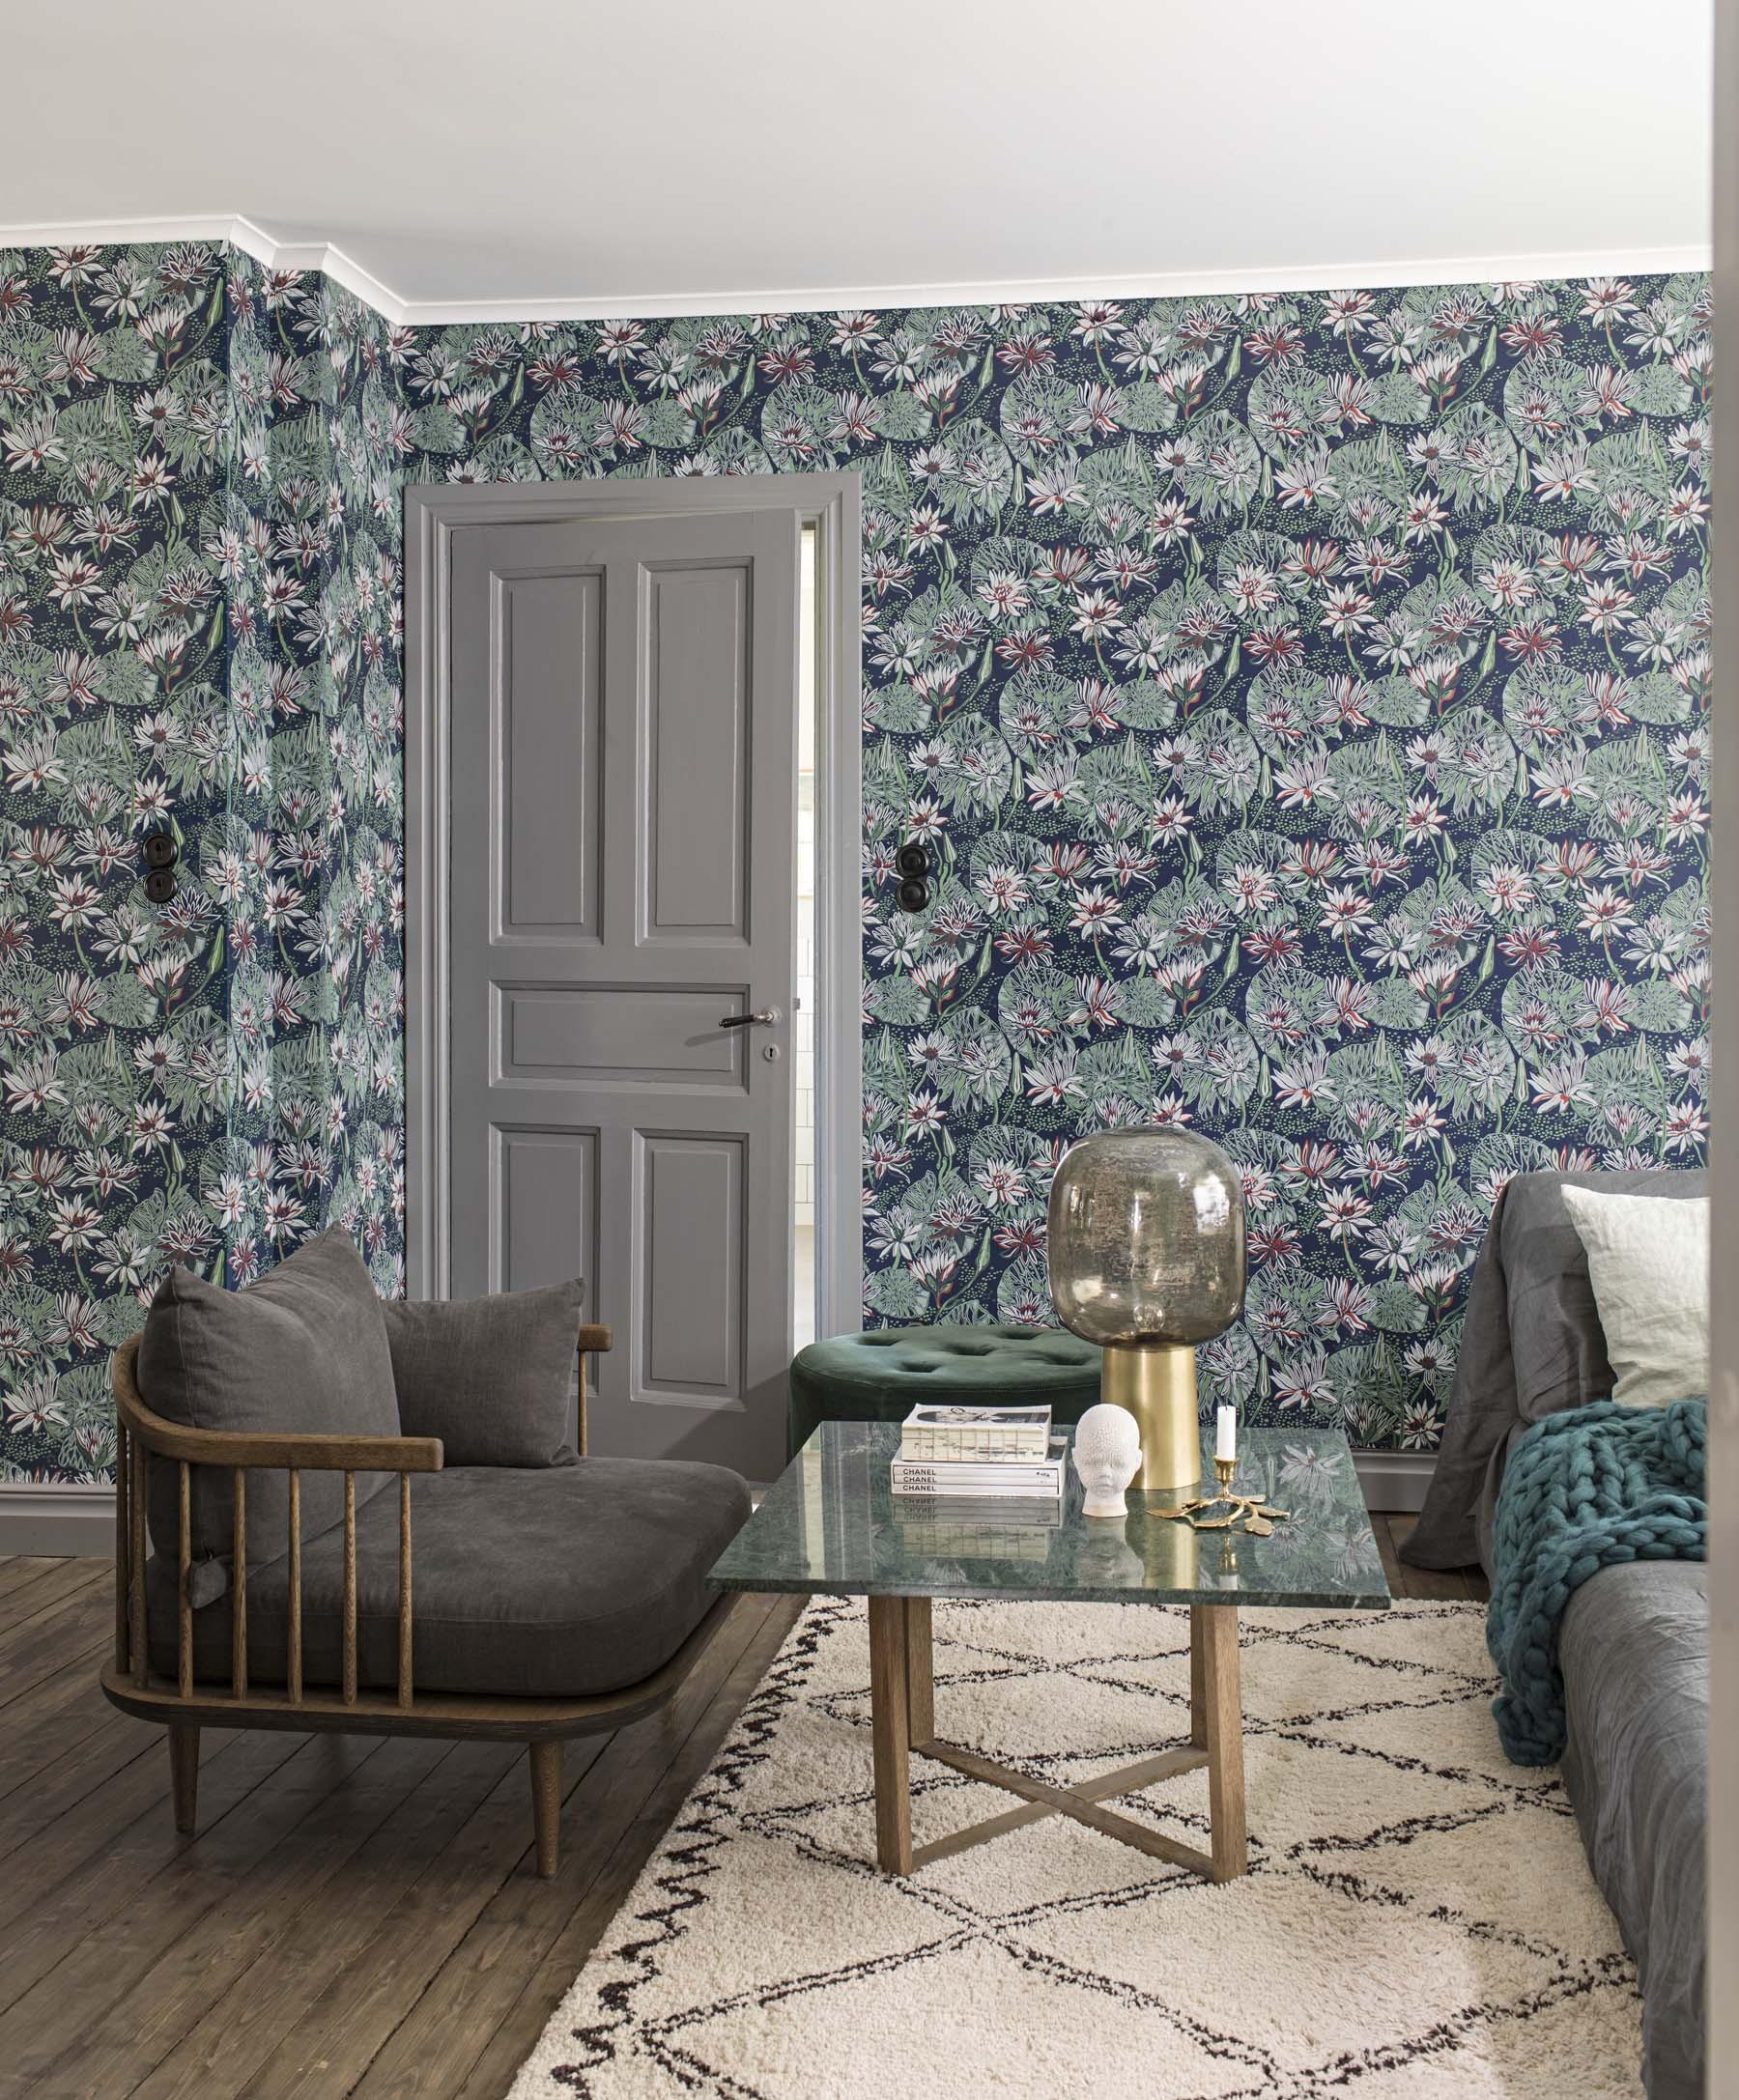 arkiv engblad engblad co skandinavische tapeten. Black Bedroom Furniture Sets. Home Design Ideas